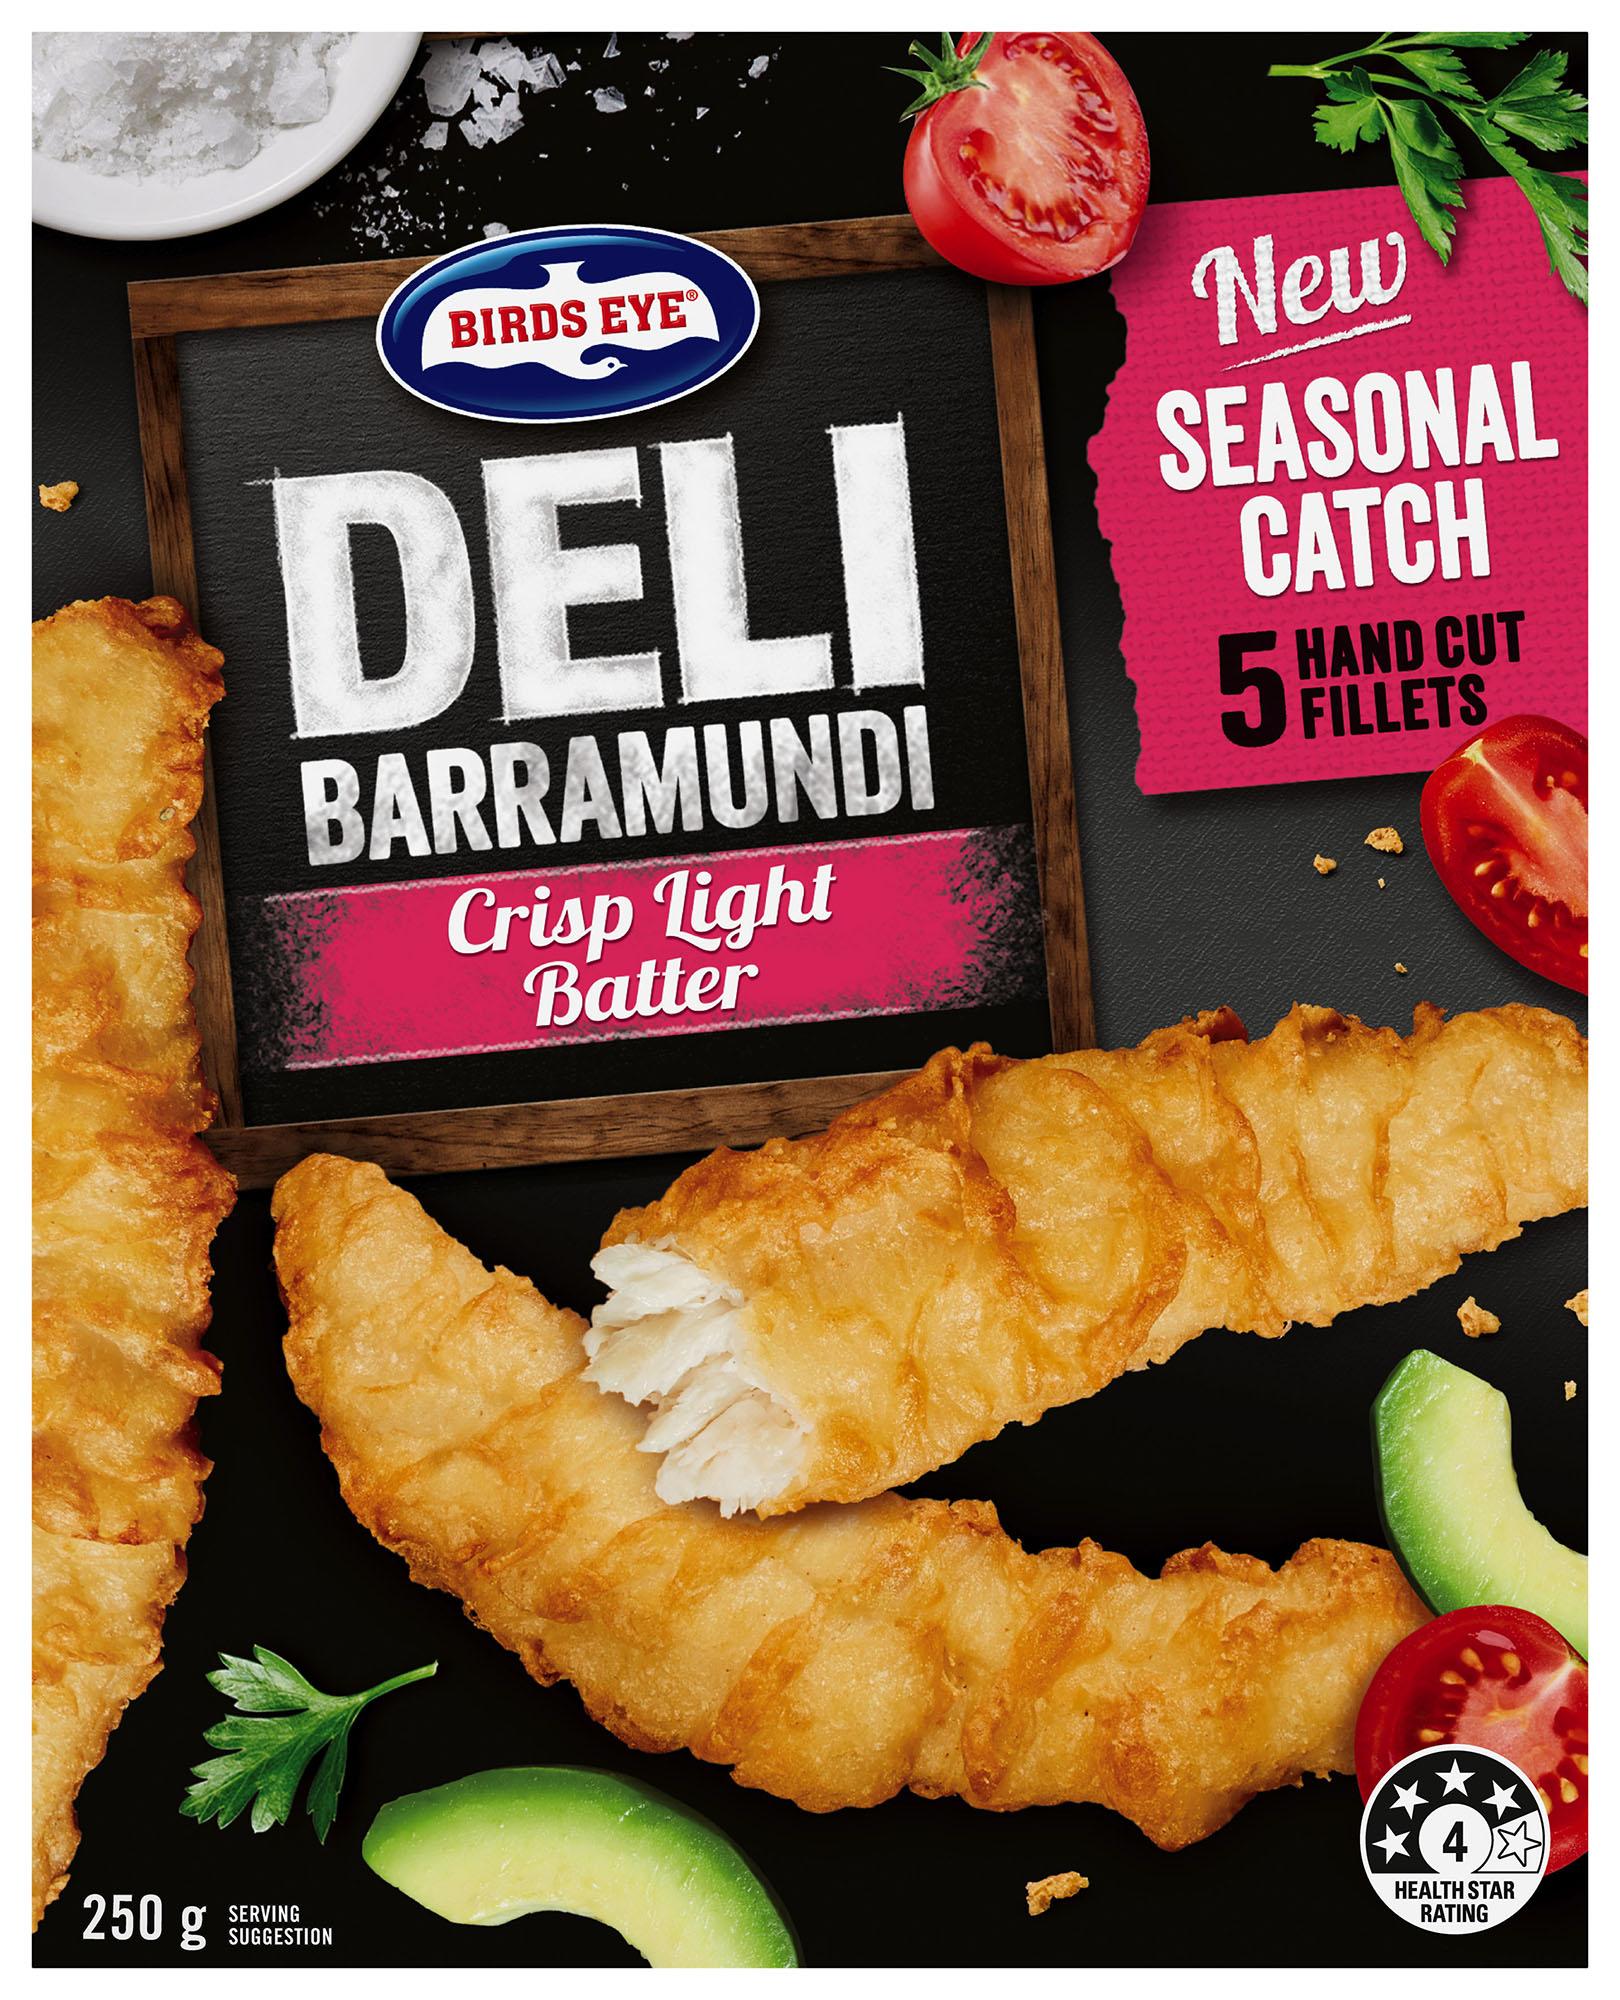 Birds Eye Deli Baramundi FMCG, Packaging, Advertising, Food styling